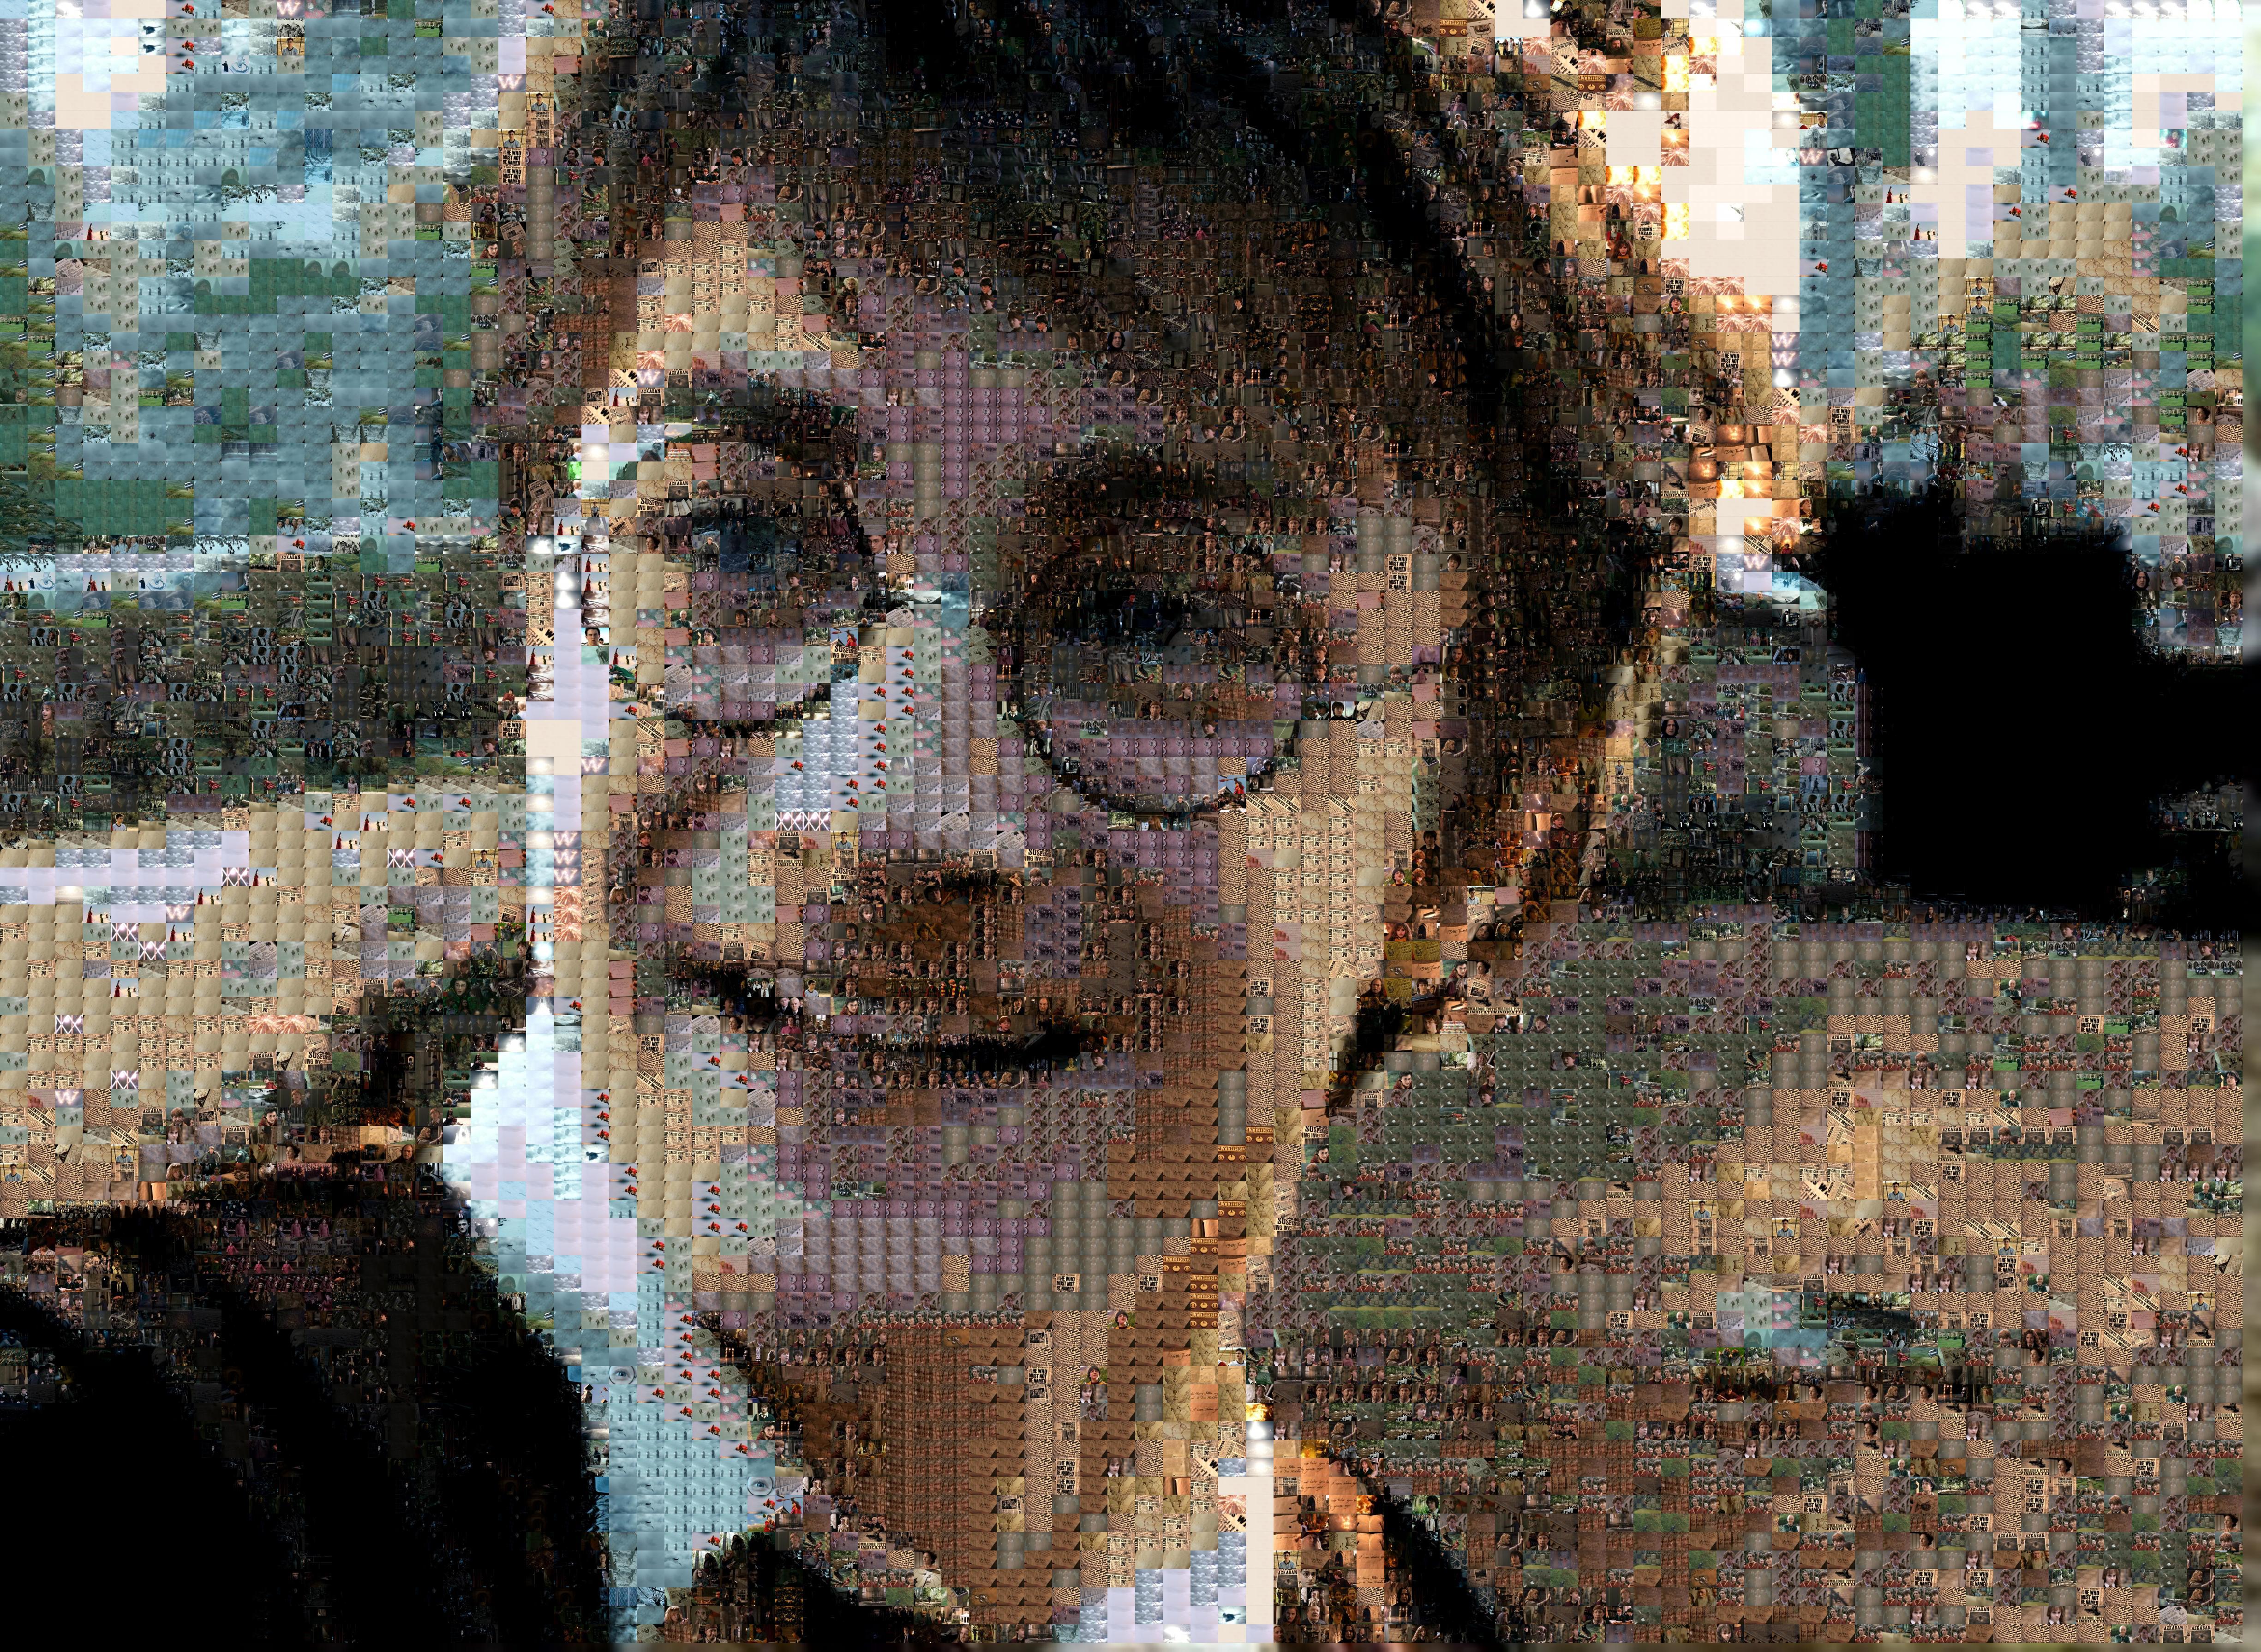 Pincers Harry Potter Harry Potter Screenshot Mosai1